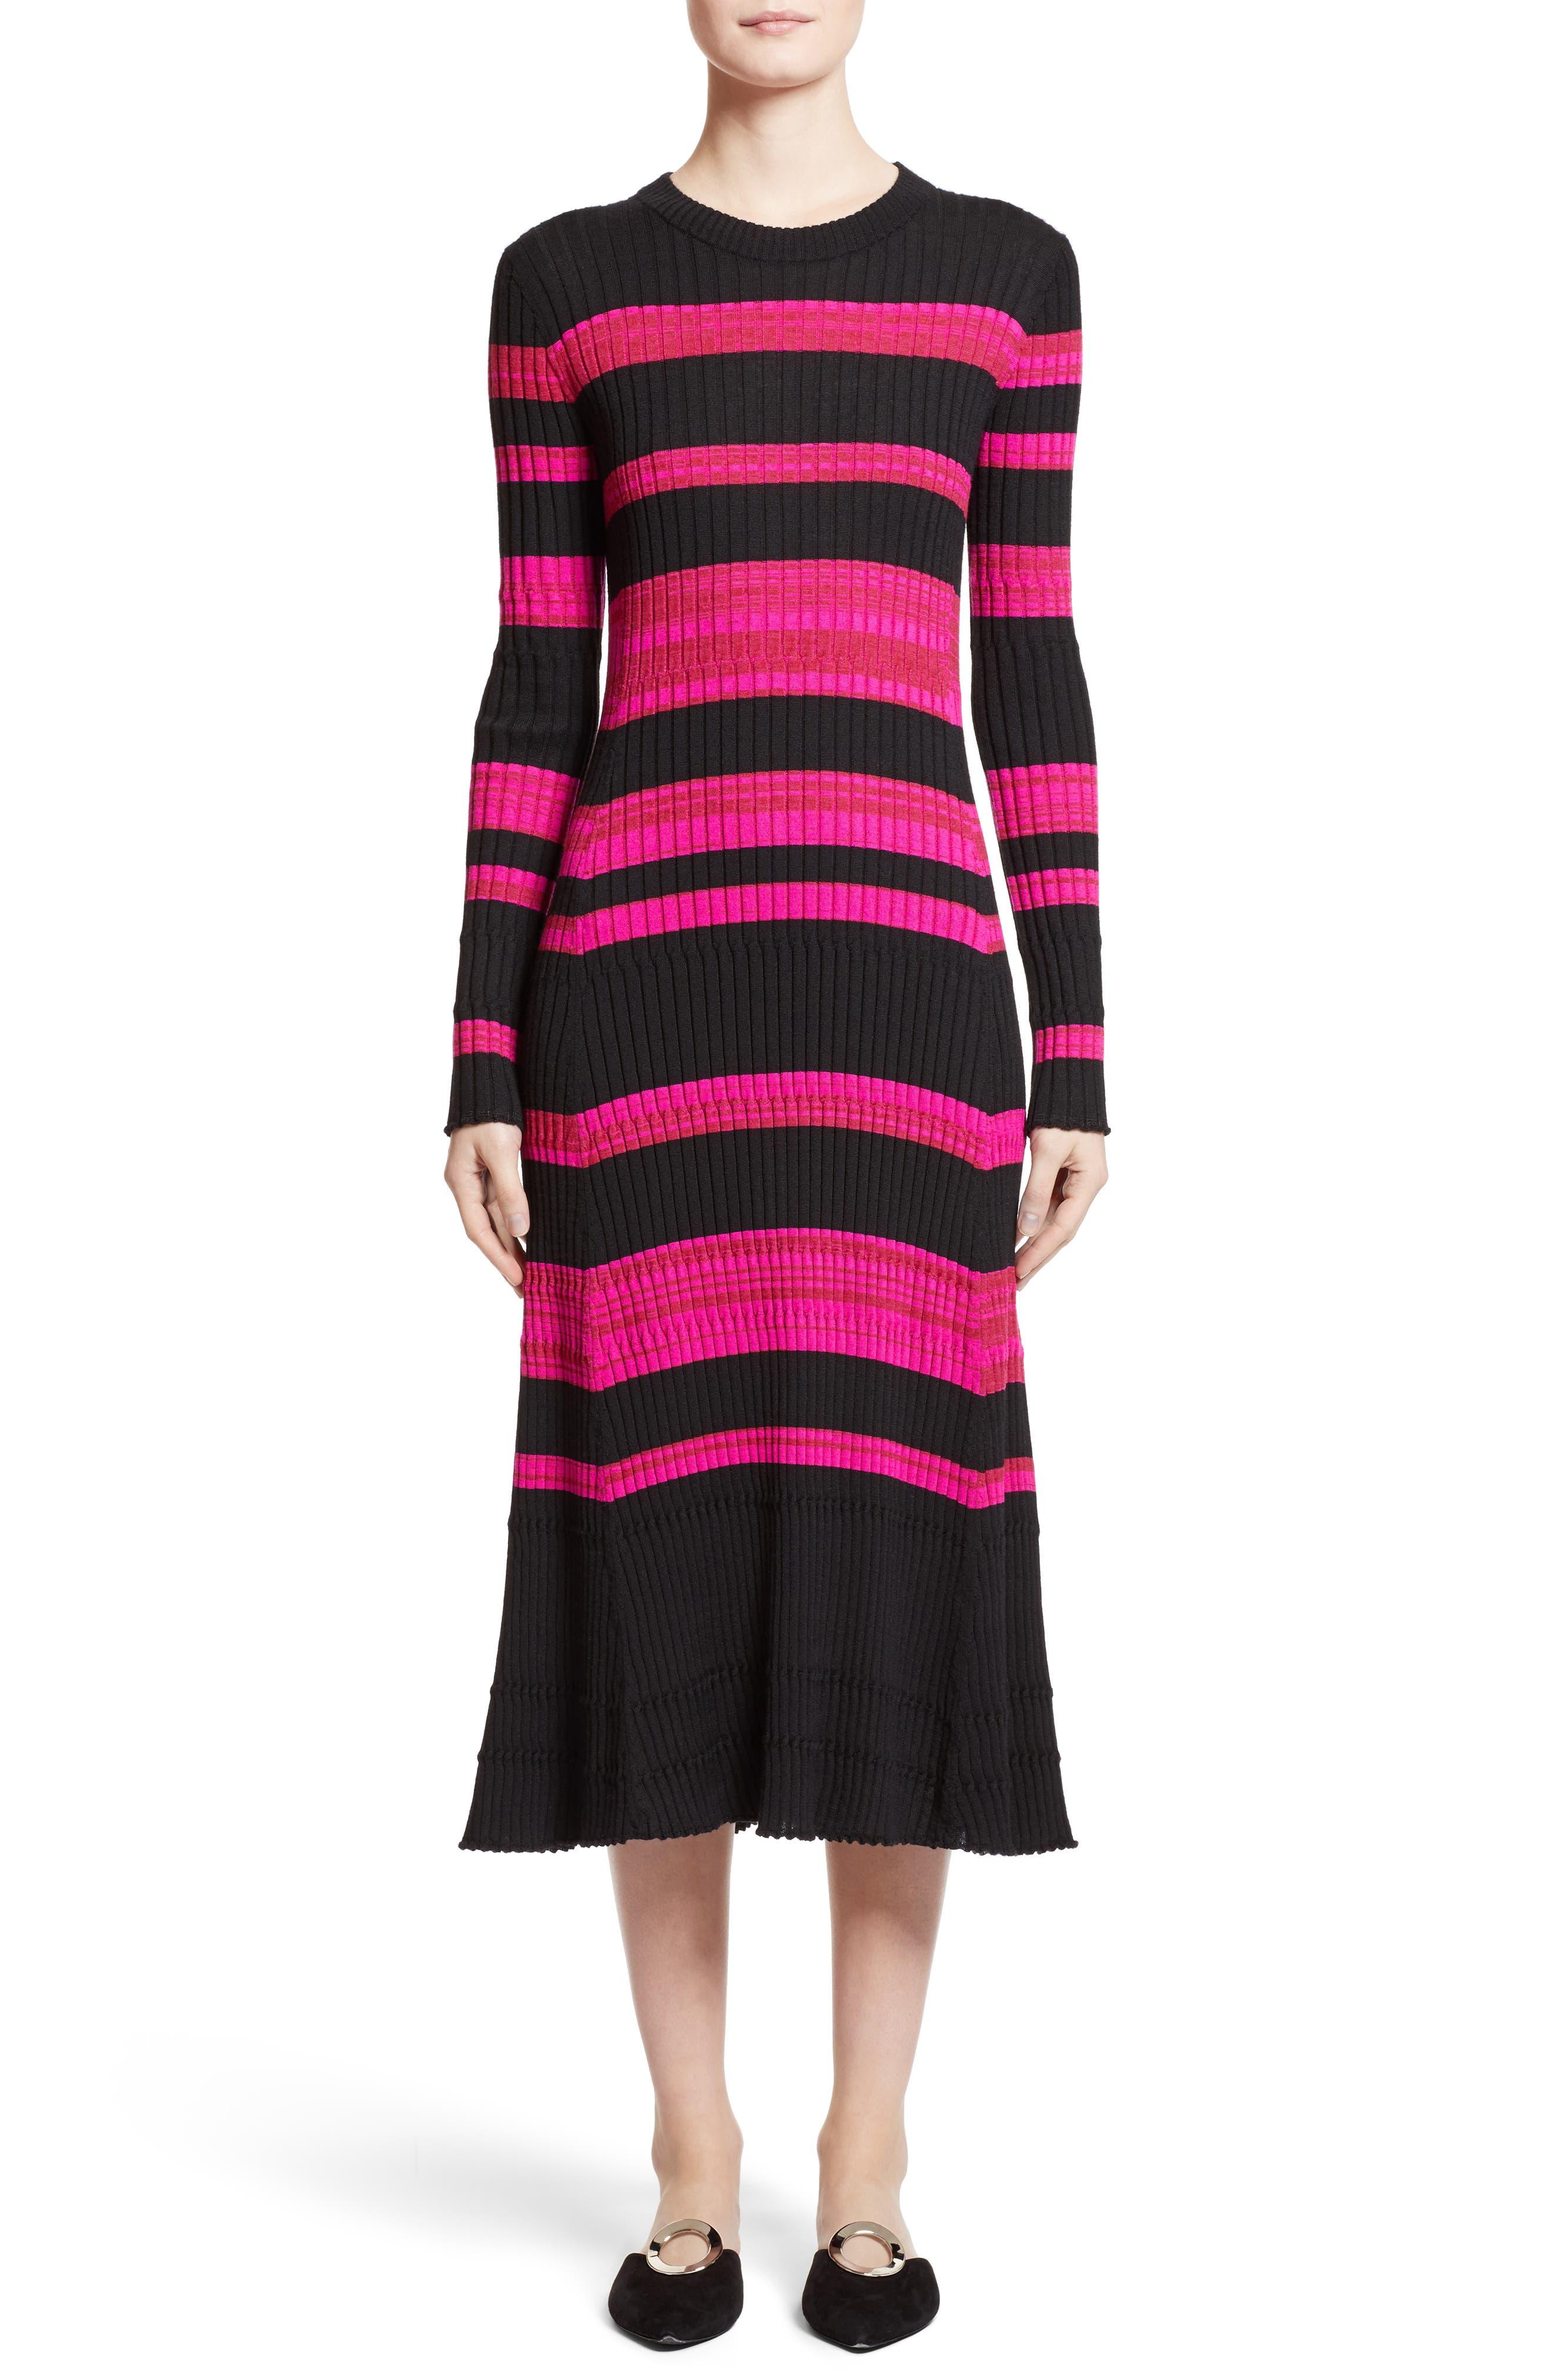 Stripe Cashmere, Wool & Silk Midi Dress,                             Main thumbnail 1, color,                             Black/ Electric Pink Multi